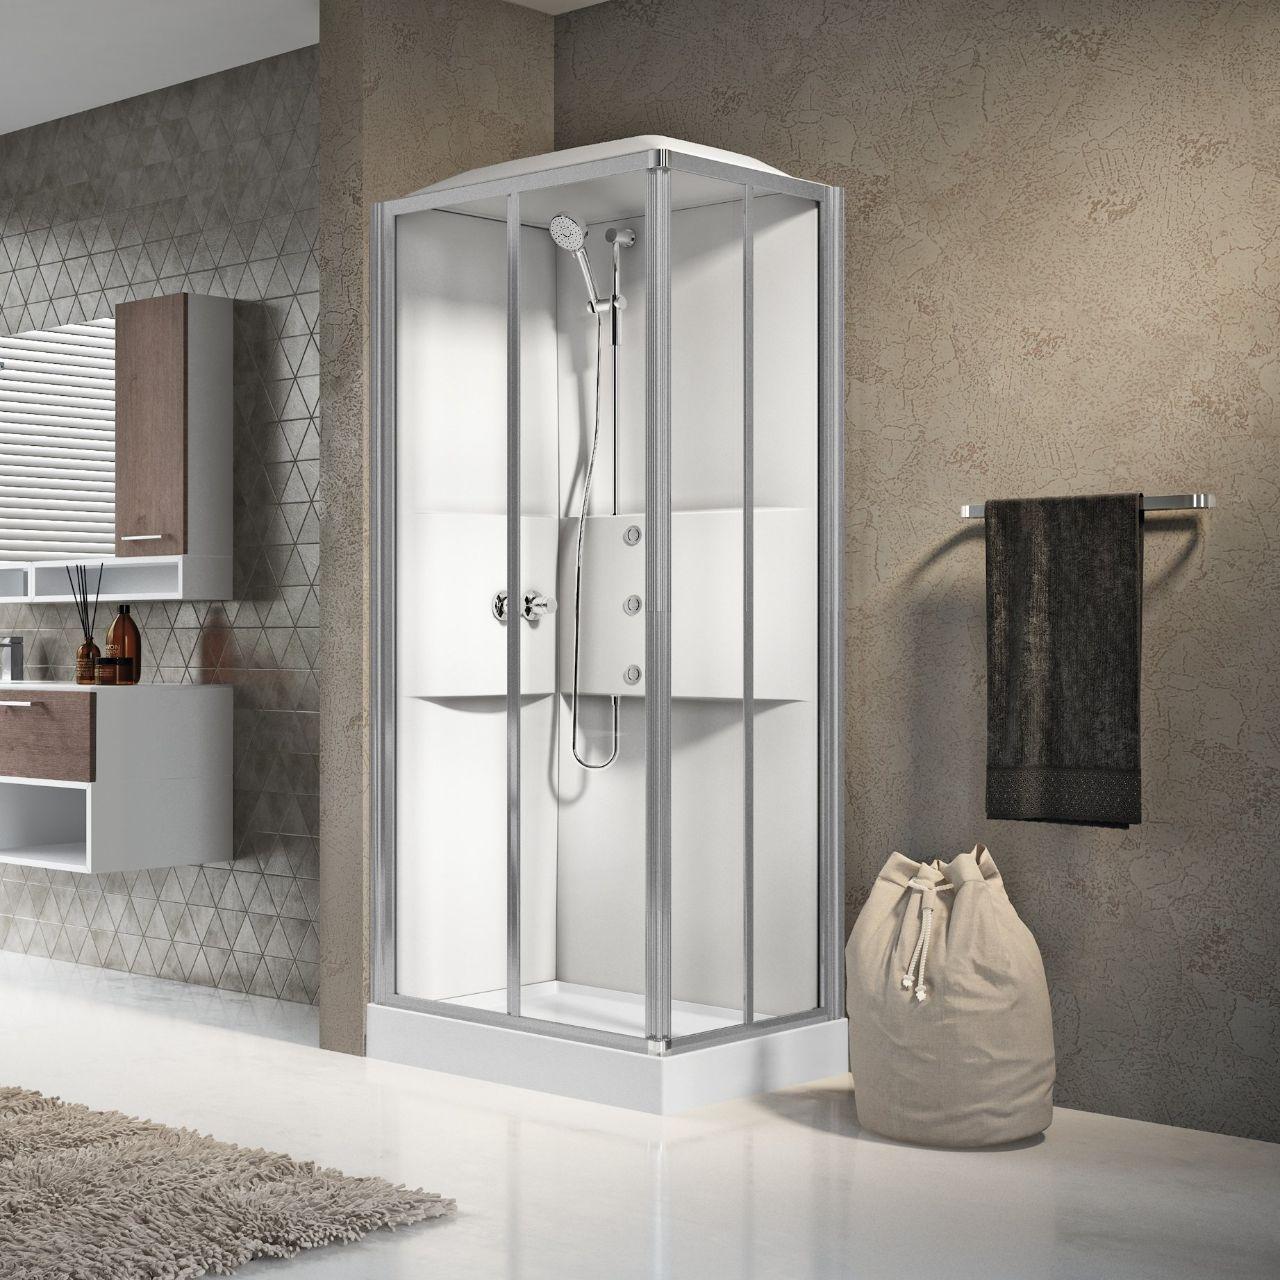 Cabinas de ducha media 2 0 a90x70 novellini - Cabinas de ducha ...